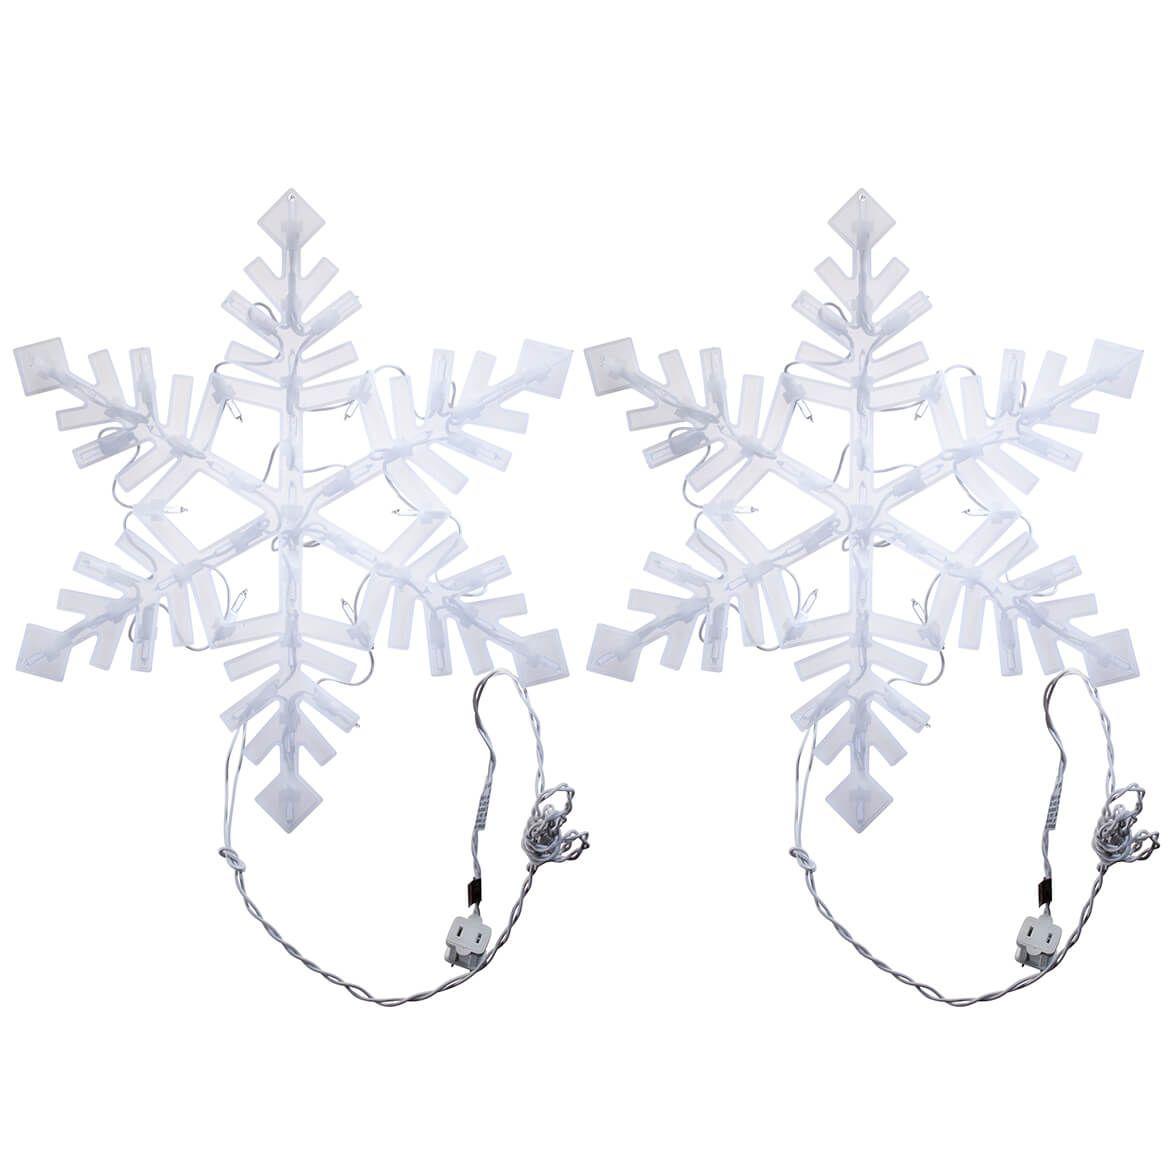 Lighted Snowflake, Set of 2-371414